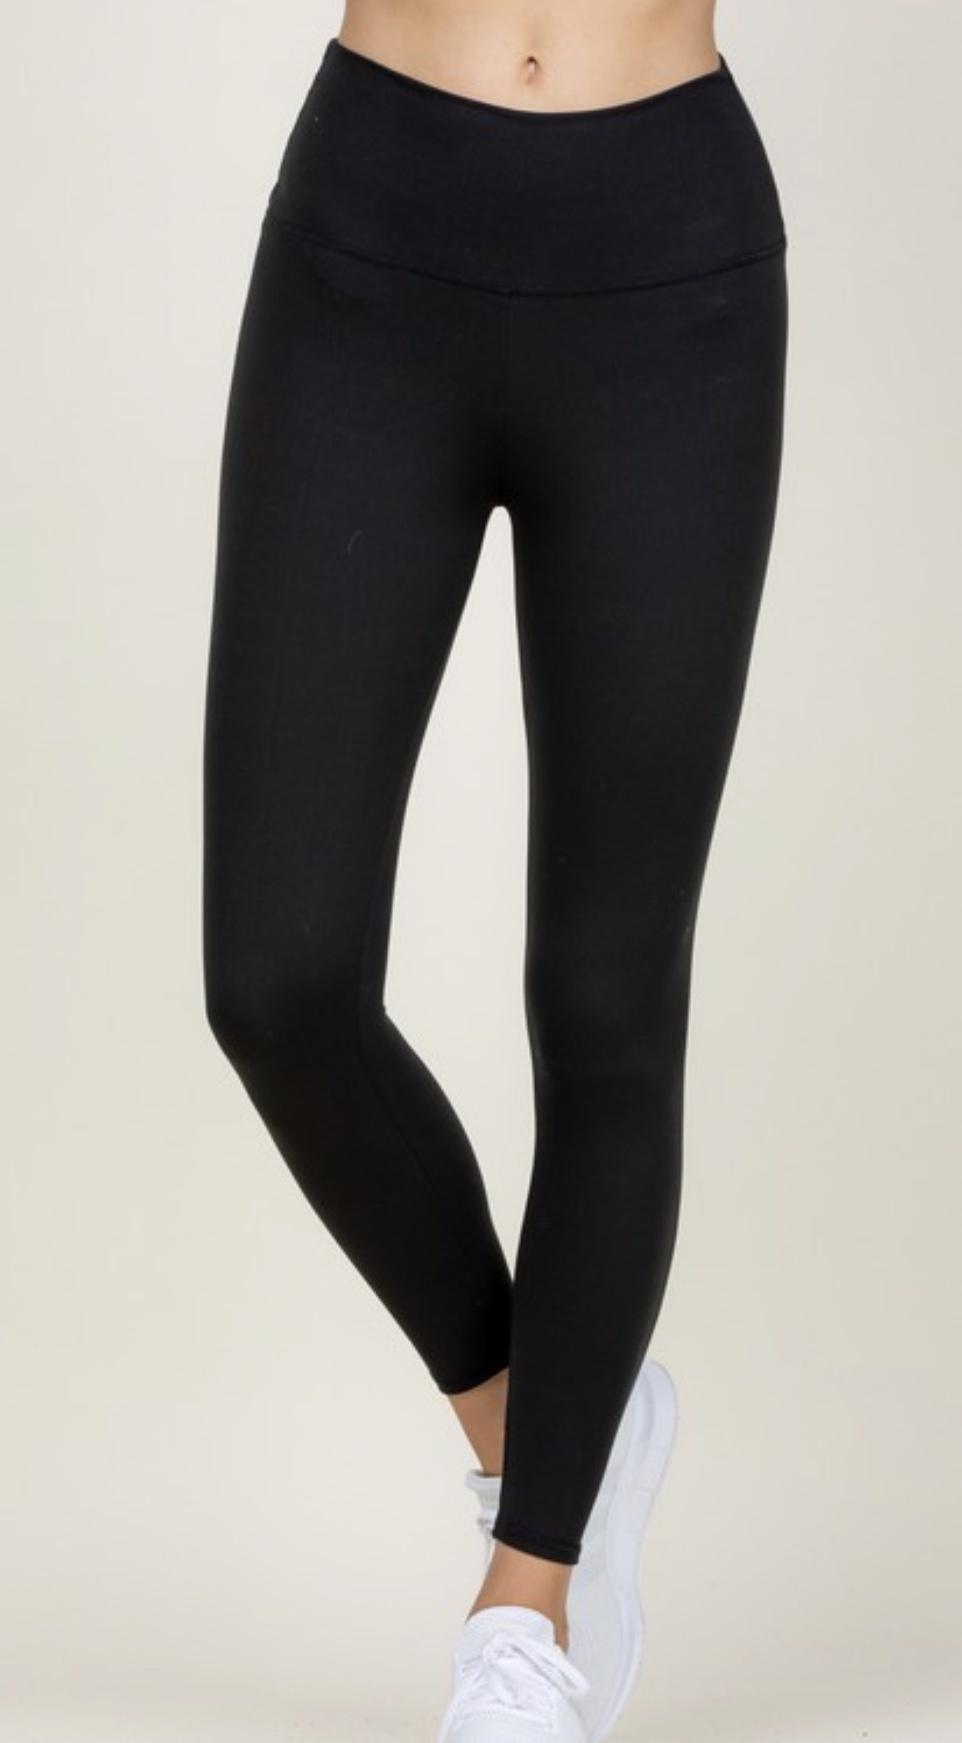 Amanda curvy soft leggings